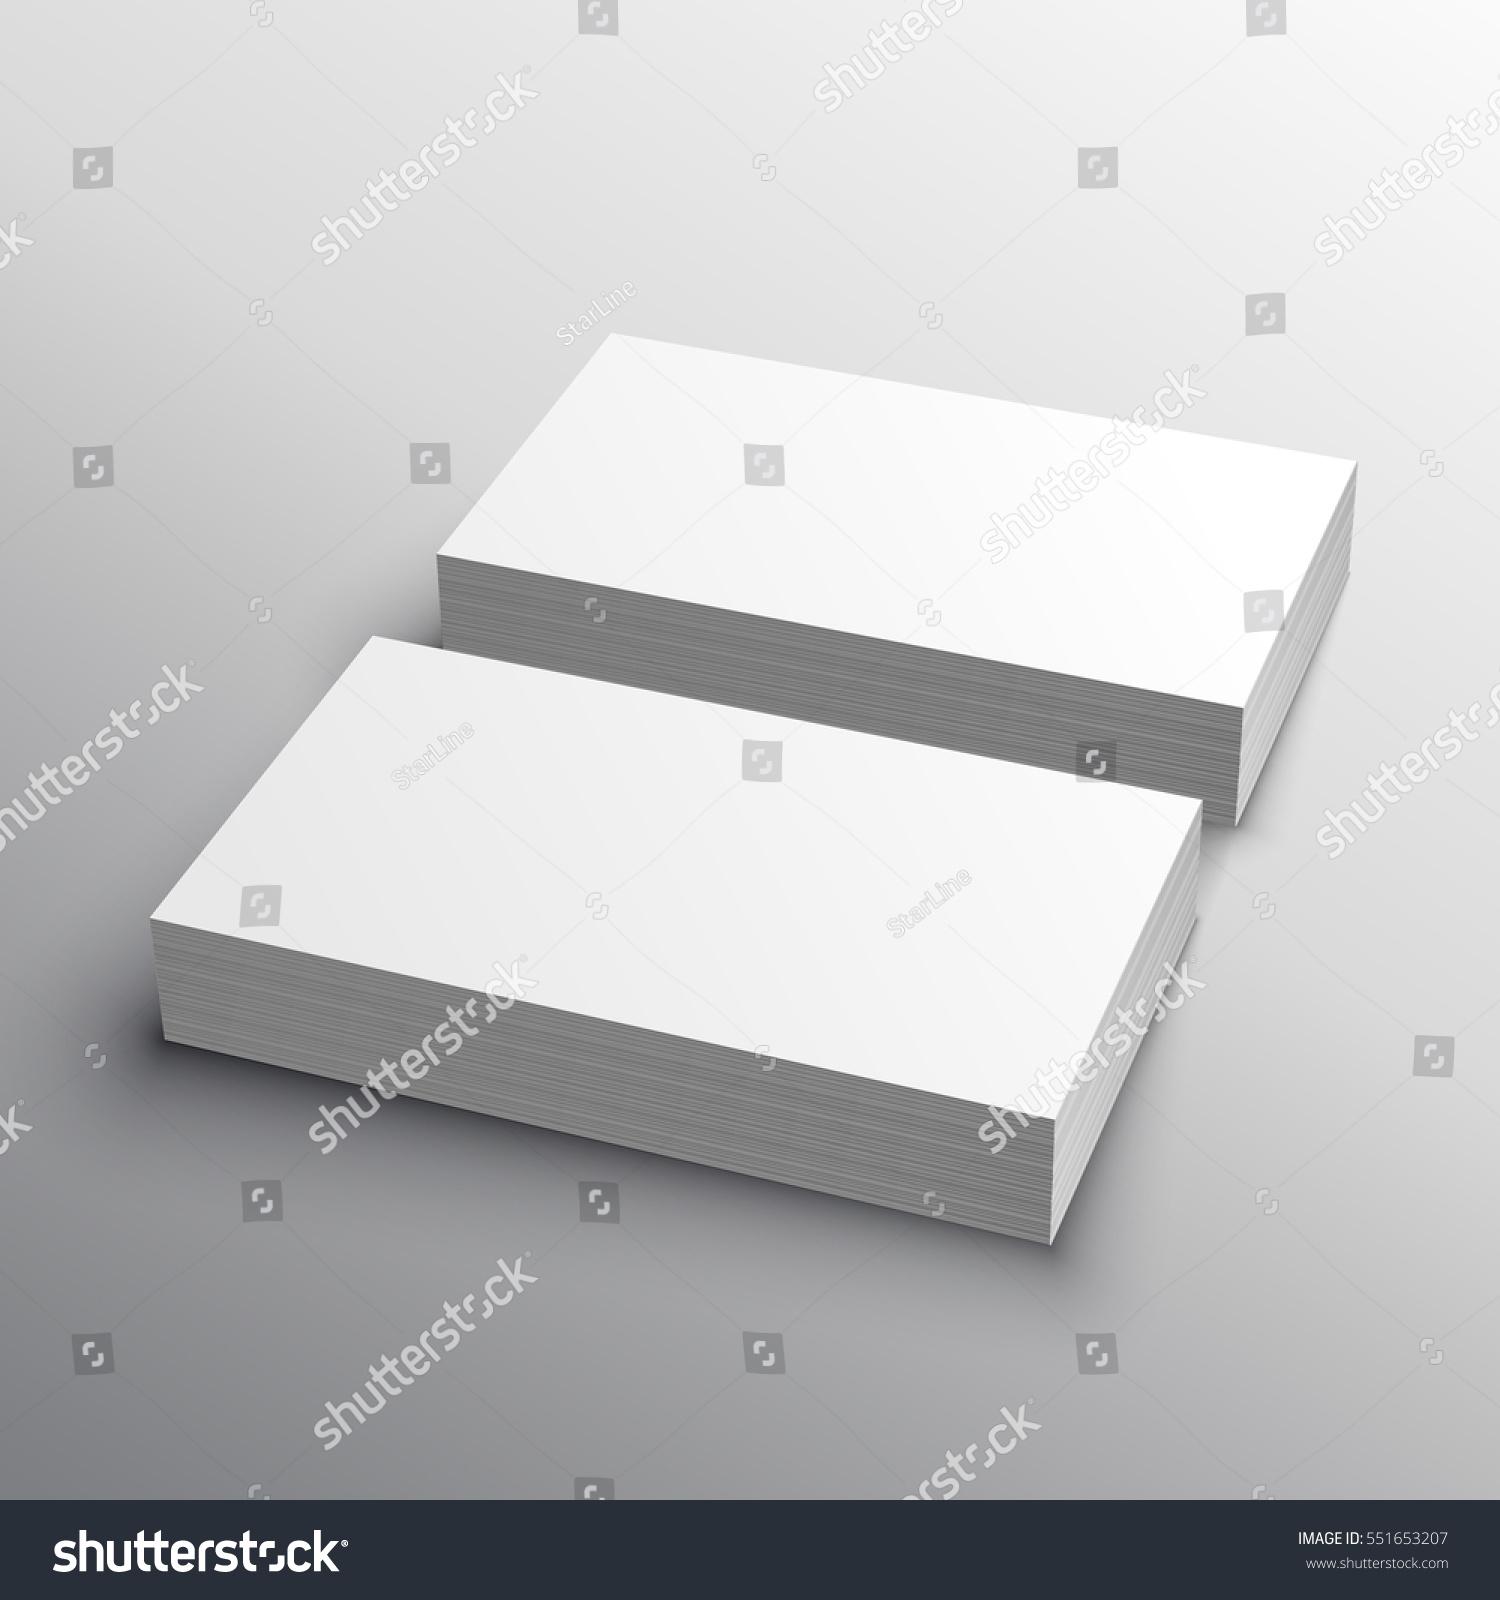 business card mockup presentation display stock vector